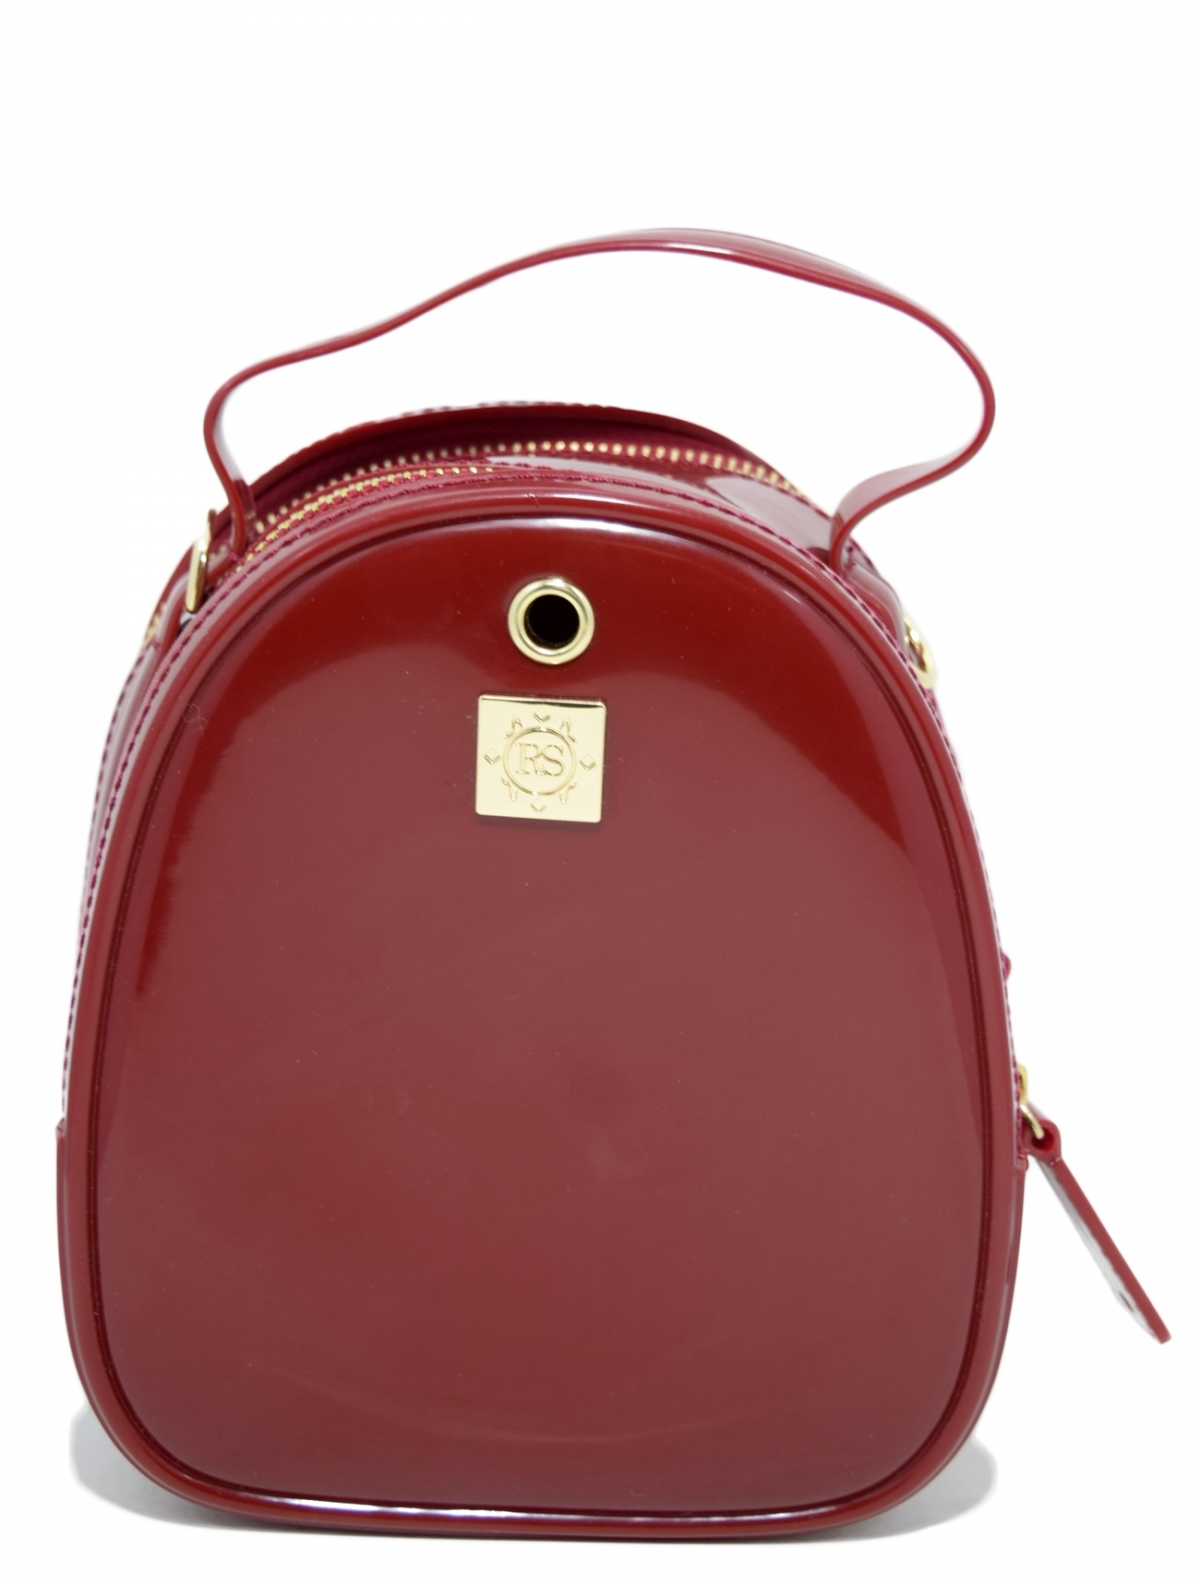 RidlStep 19230-487-1 рюкзак красный